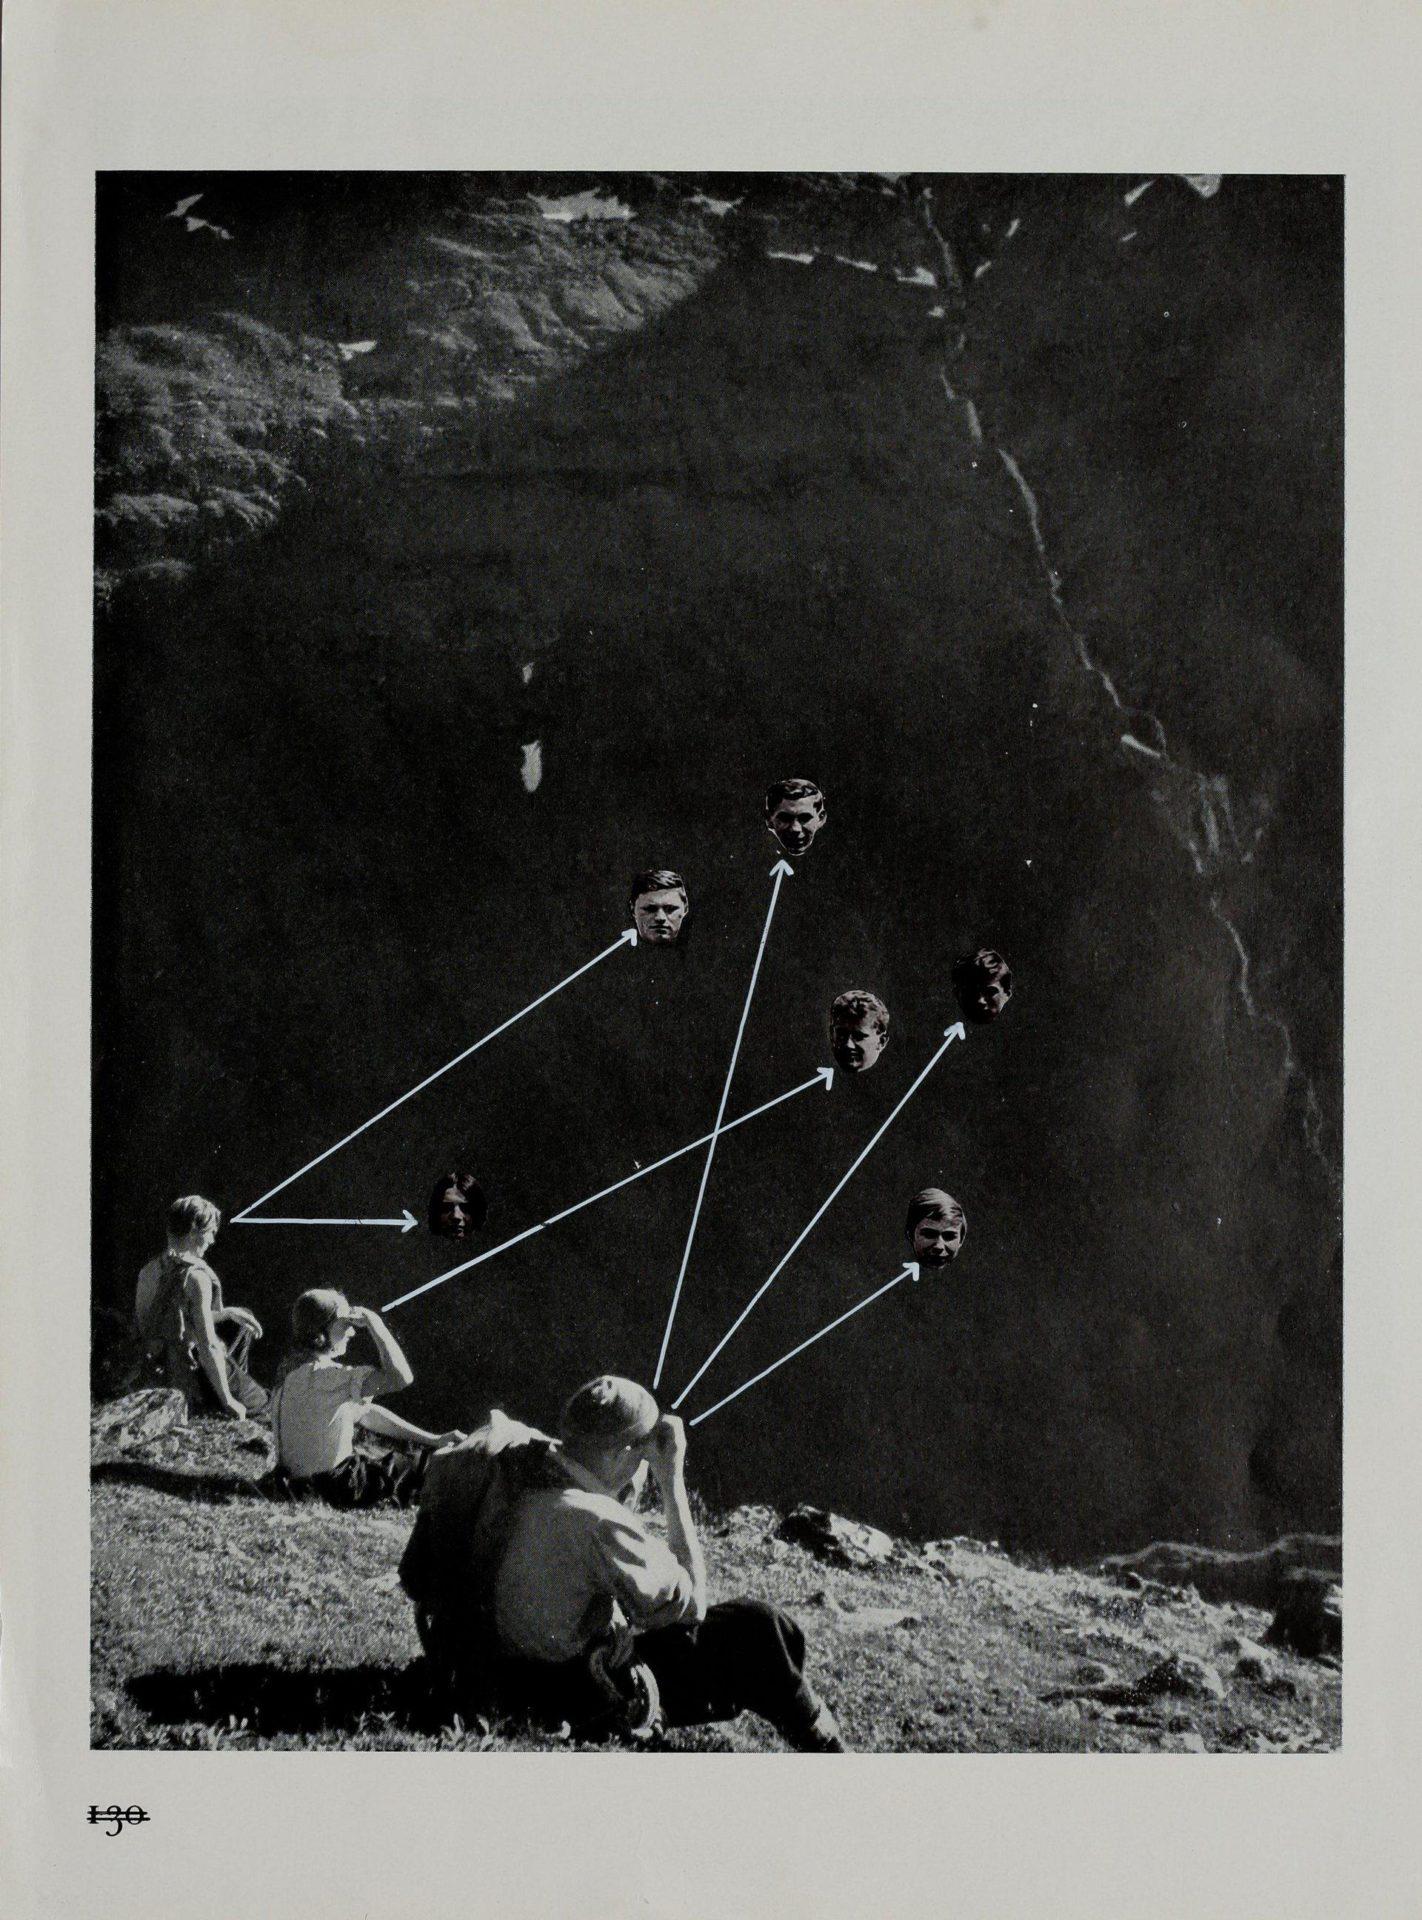 Eva Kot'átková, Untitled, from the series Parallel Biography, 2011